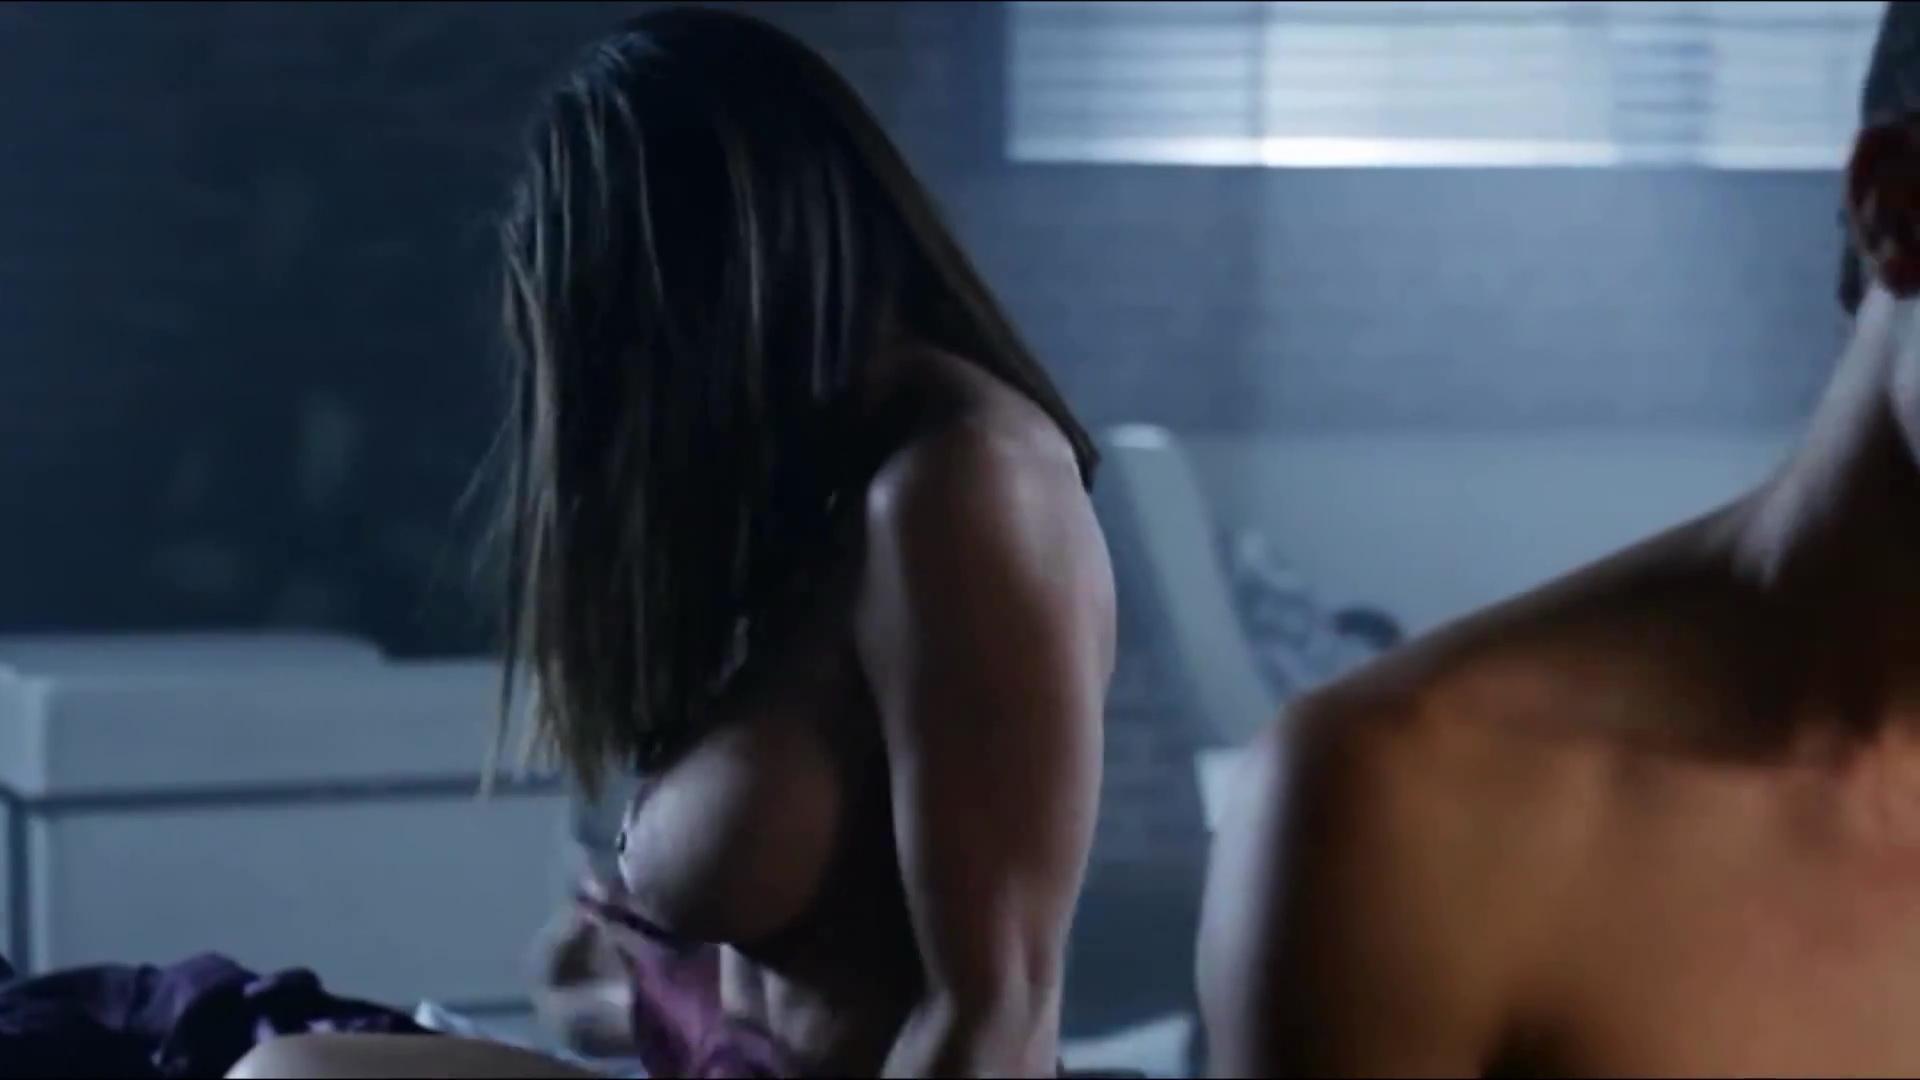 charisma-carpenter-nude-sex-scene-milf-public-bondage-porn-pics